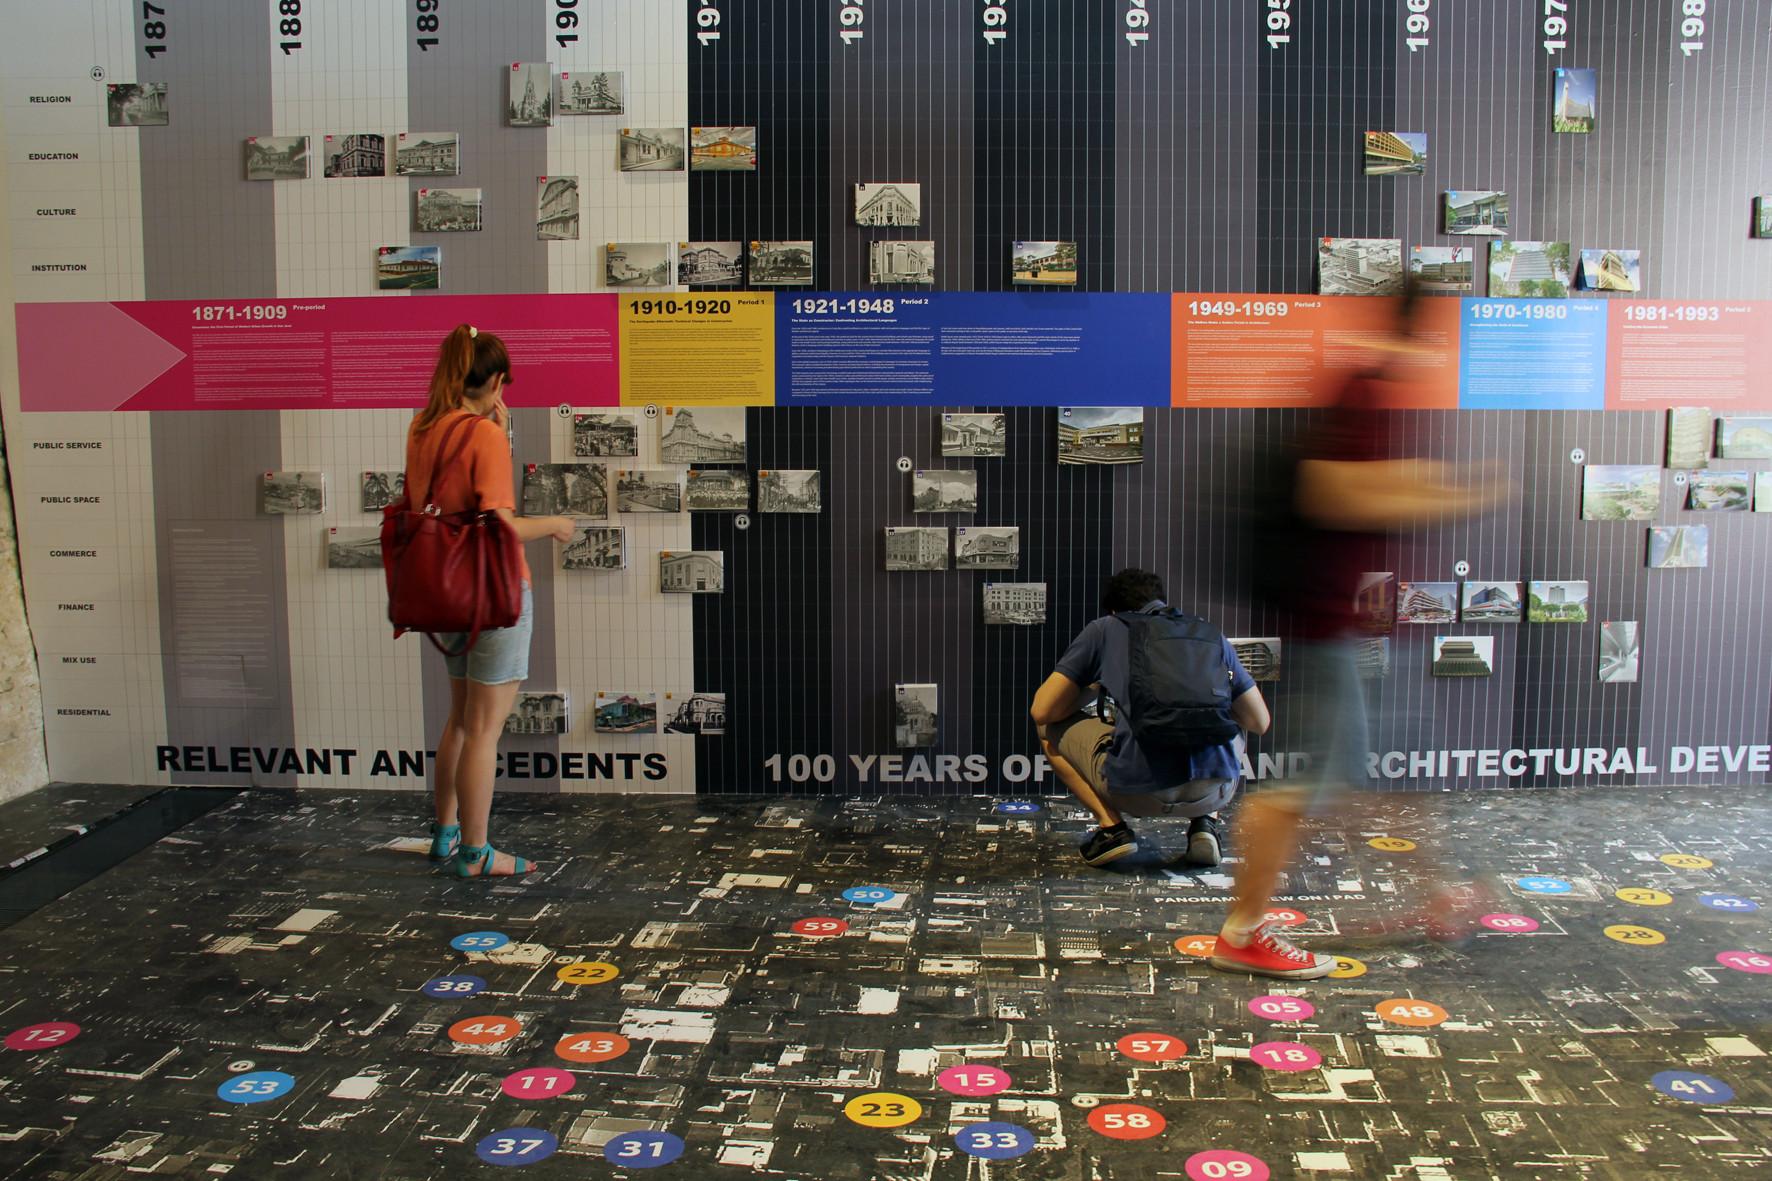 Ticollage City / Costa Rica Pavilion at the Venice Biennale 2014, Courtesy of Costa Rica Pavilion